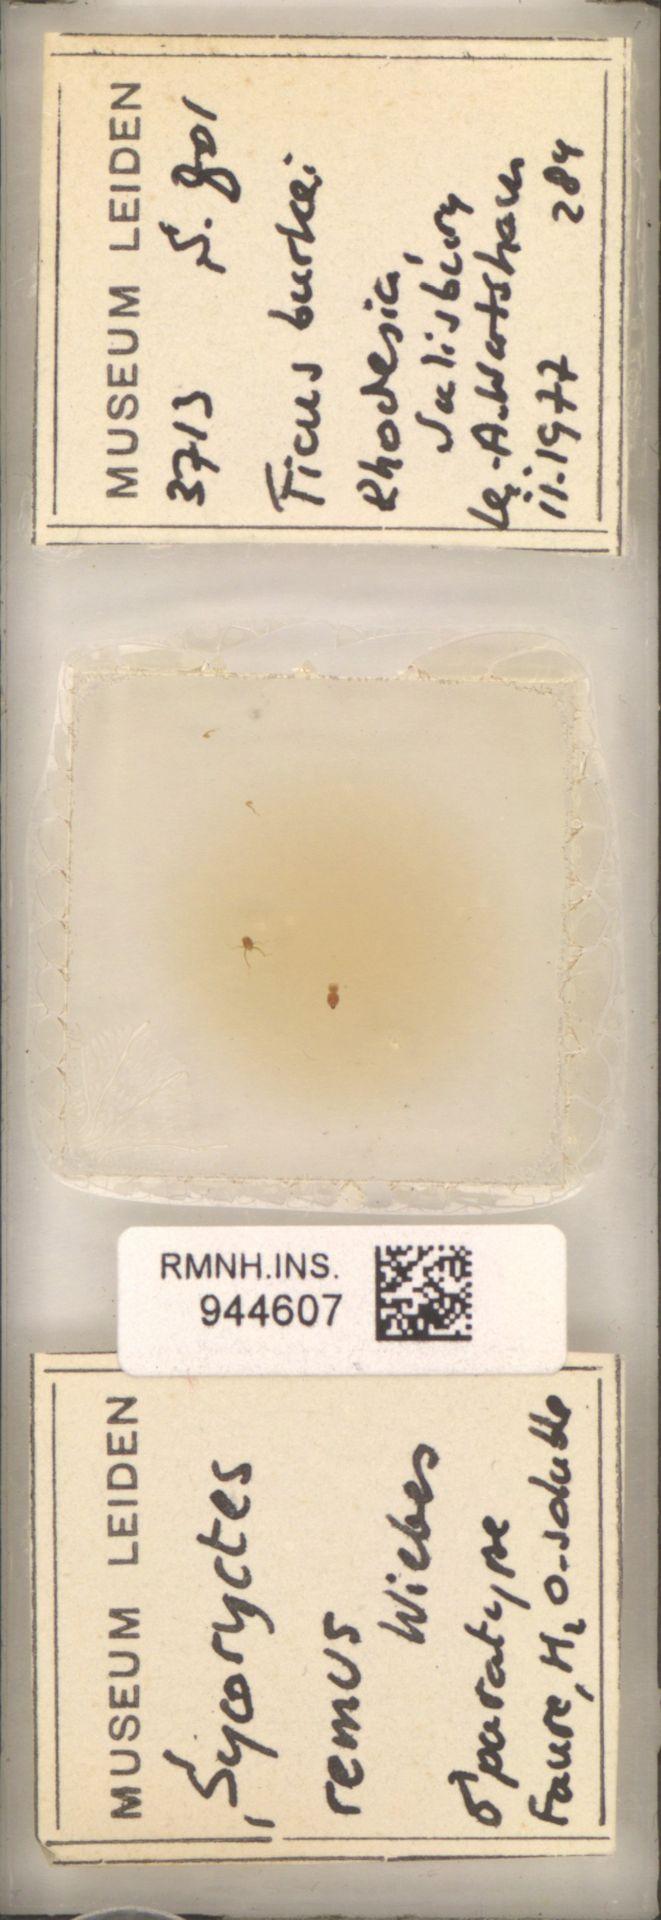 RMNH.INS.944607 | Sycoryctes remus Wiebes